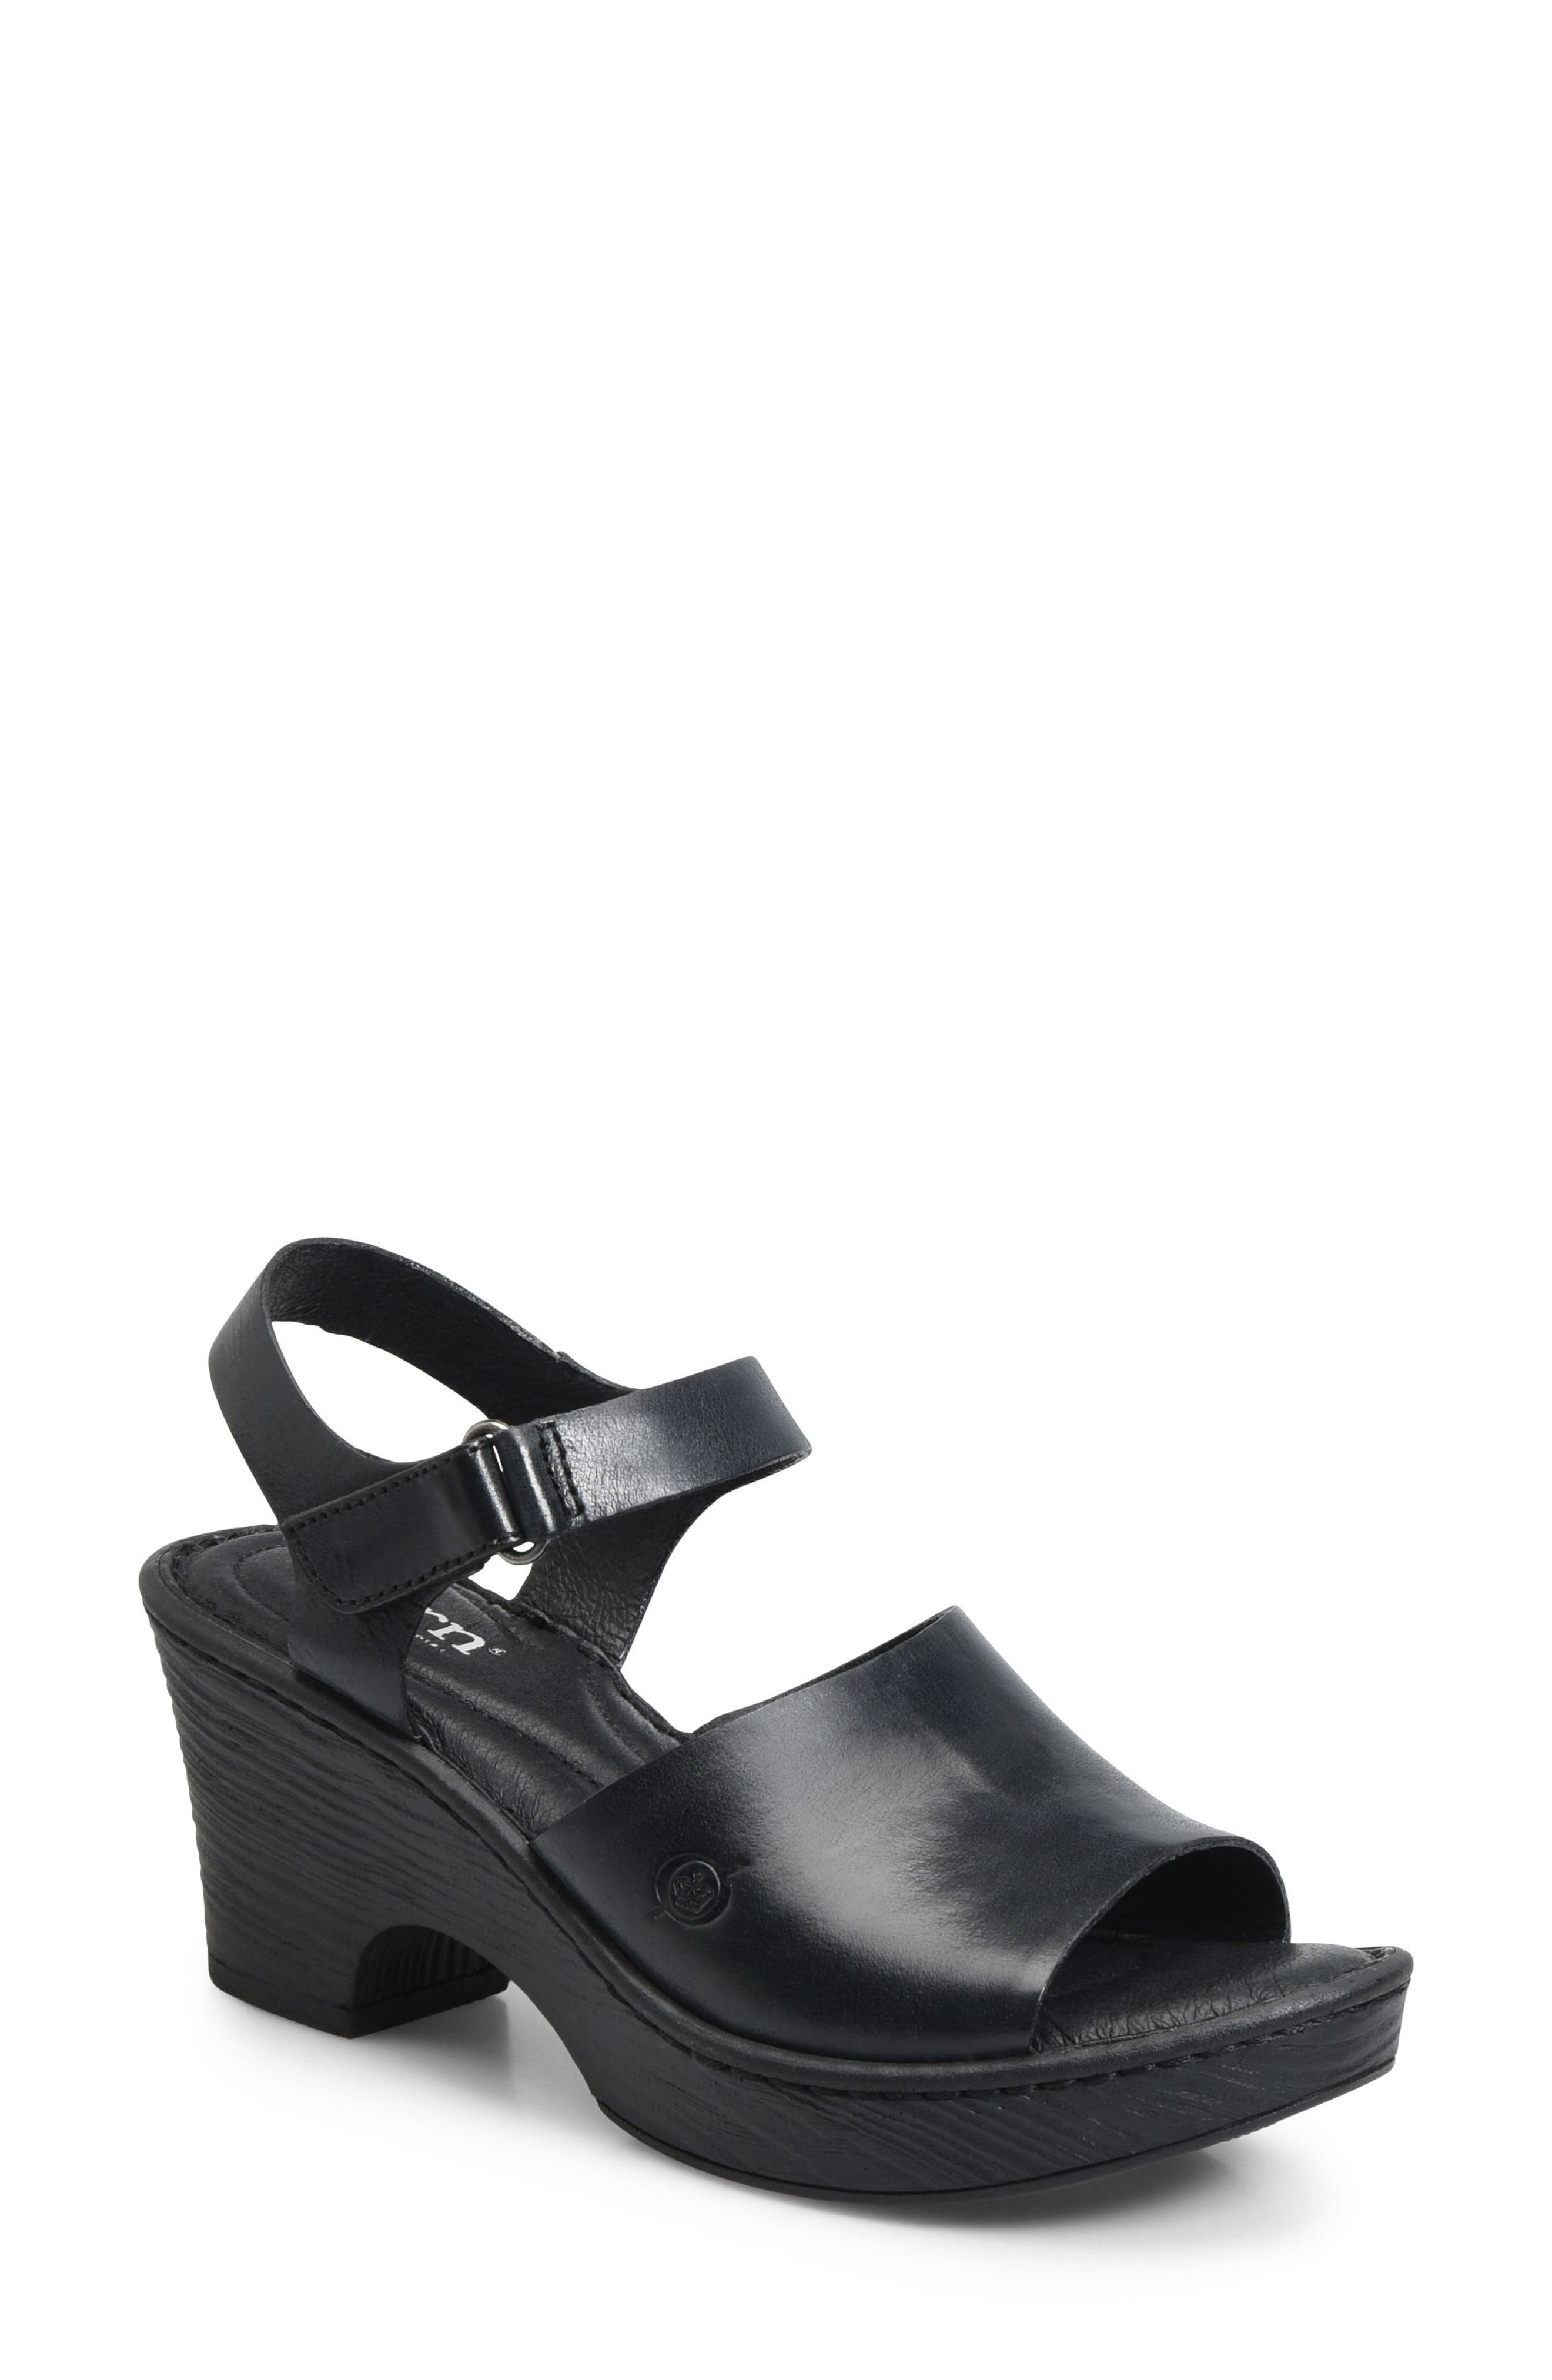 Canna Platform Sandal,                             Main thumbnail 1, color,                             001